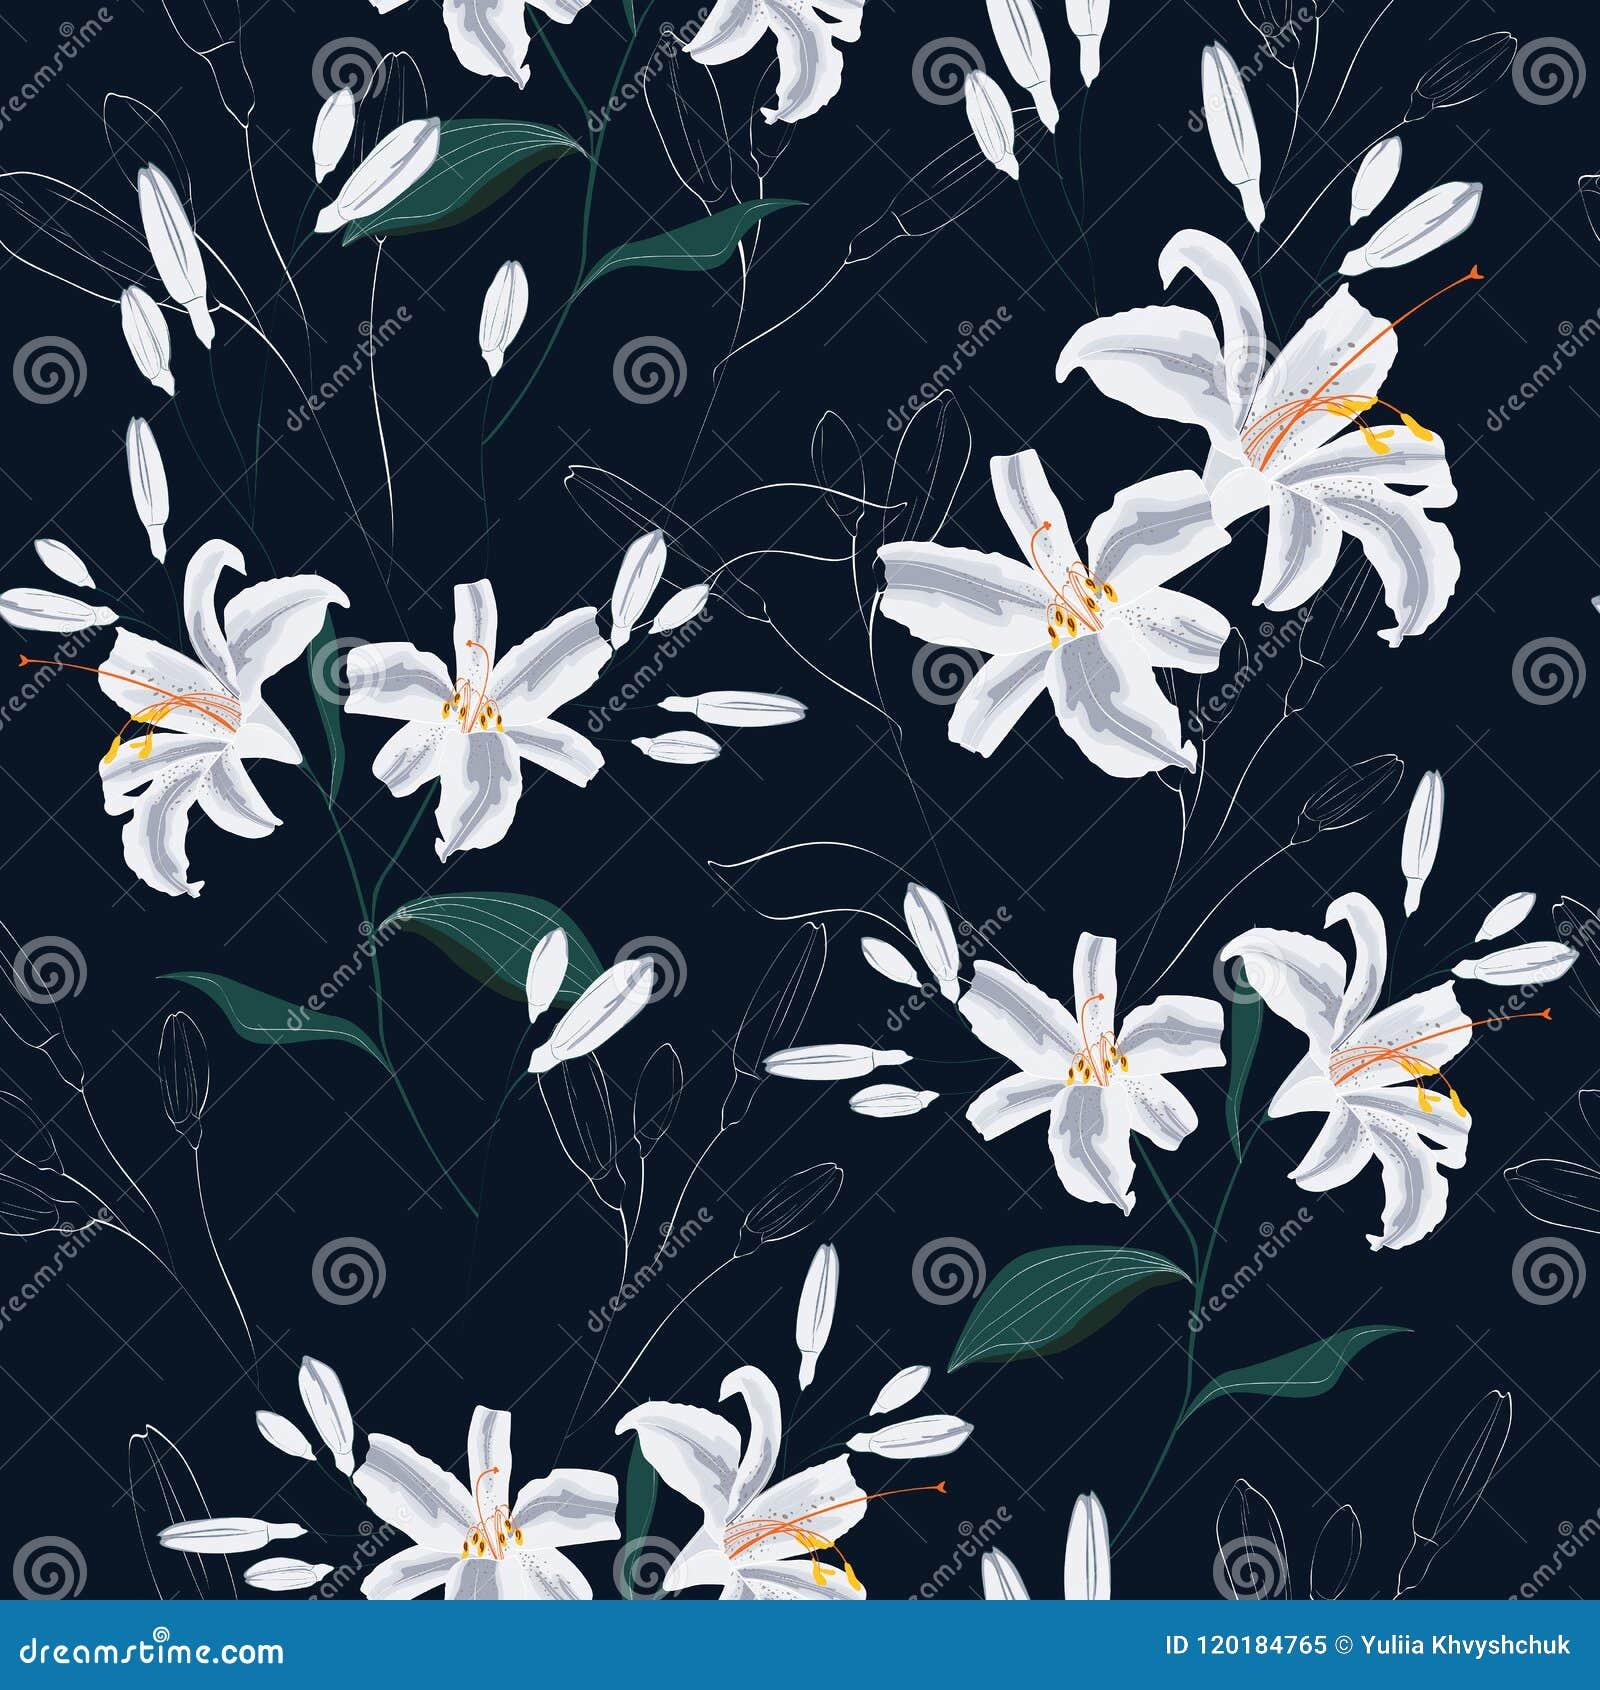 Beautiful white lilies flowers seamless pattern on black background beautiful white lilies flowers seamless pattern on black background izmirmasajfo